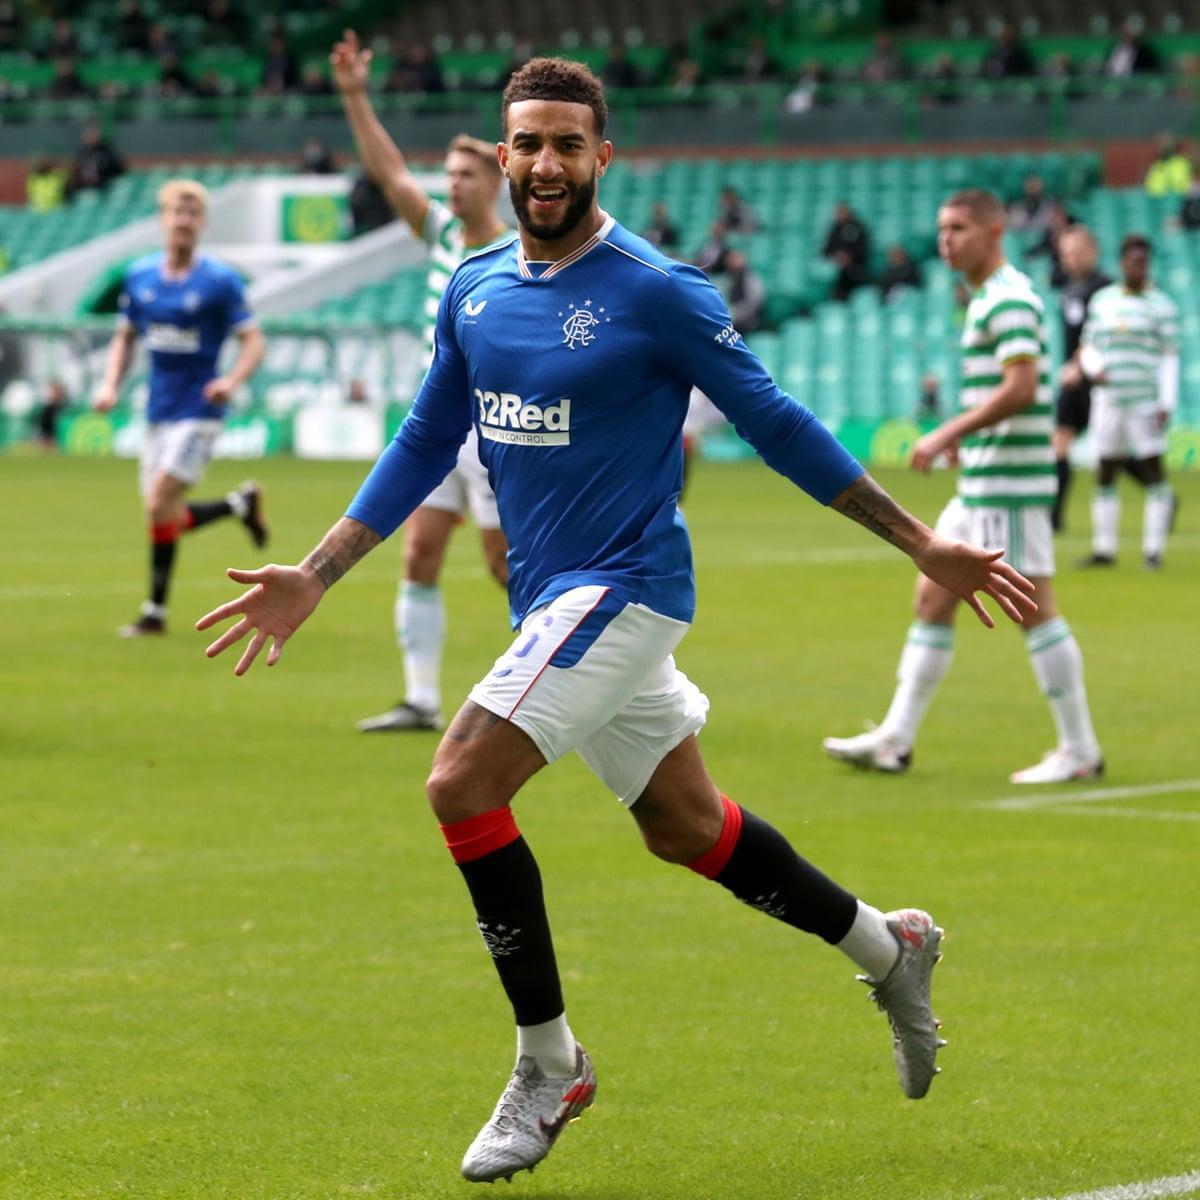 Celtic 0 2 Rangers Scottish Premiership As It Happened Football The Guardian